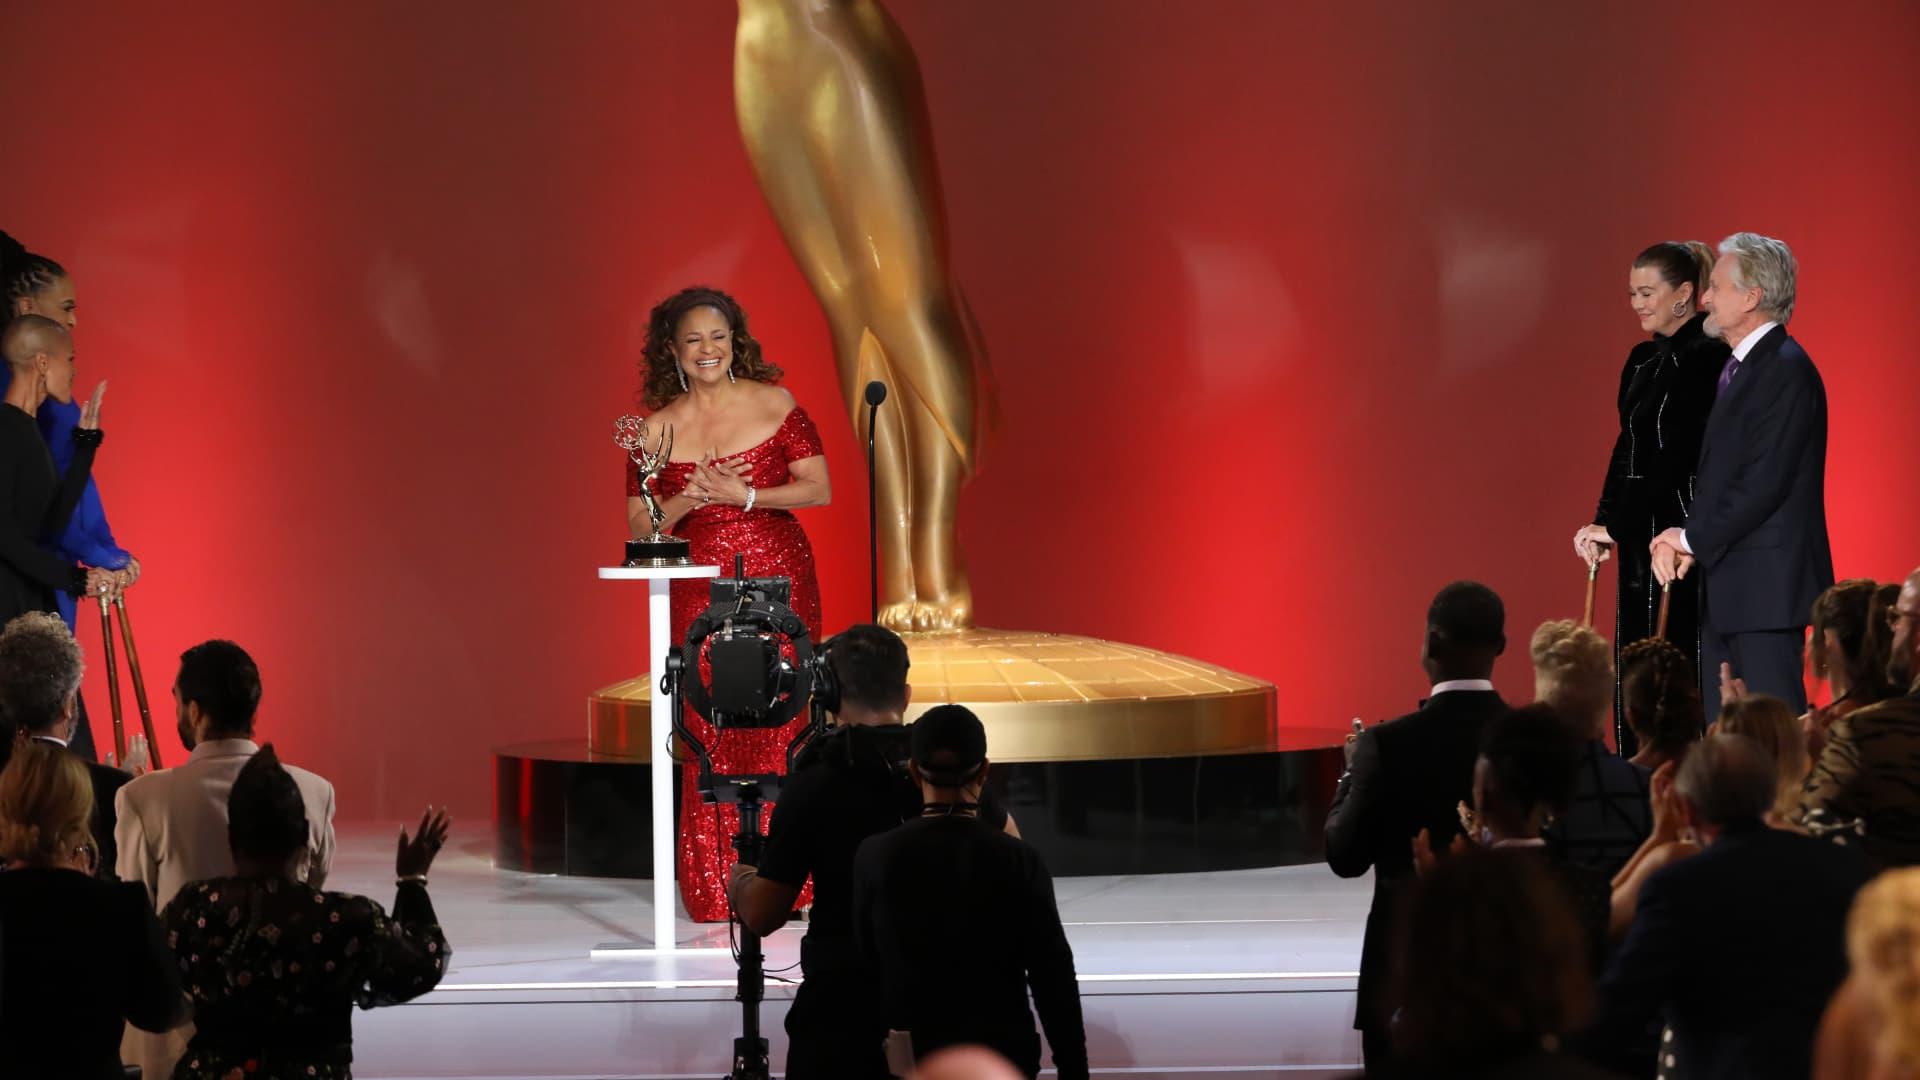 Jada Pinkett Smith, Ava DuVernay, Debbie Allen, Ellen Pompeo, and Michael Douglas appear at the 73rd Emmy Awards.